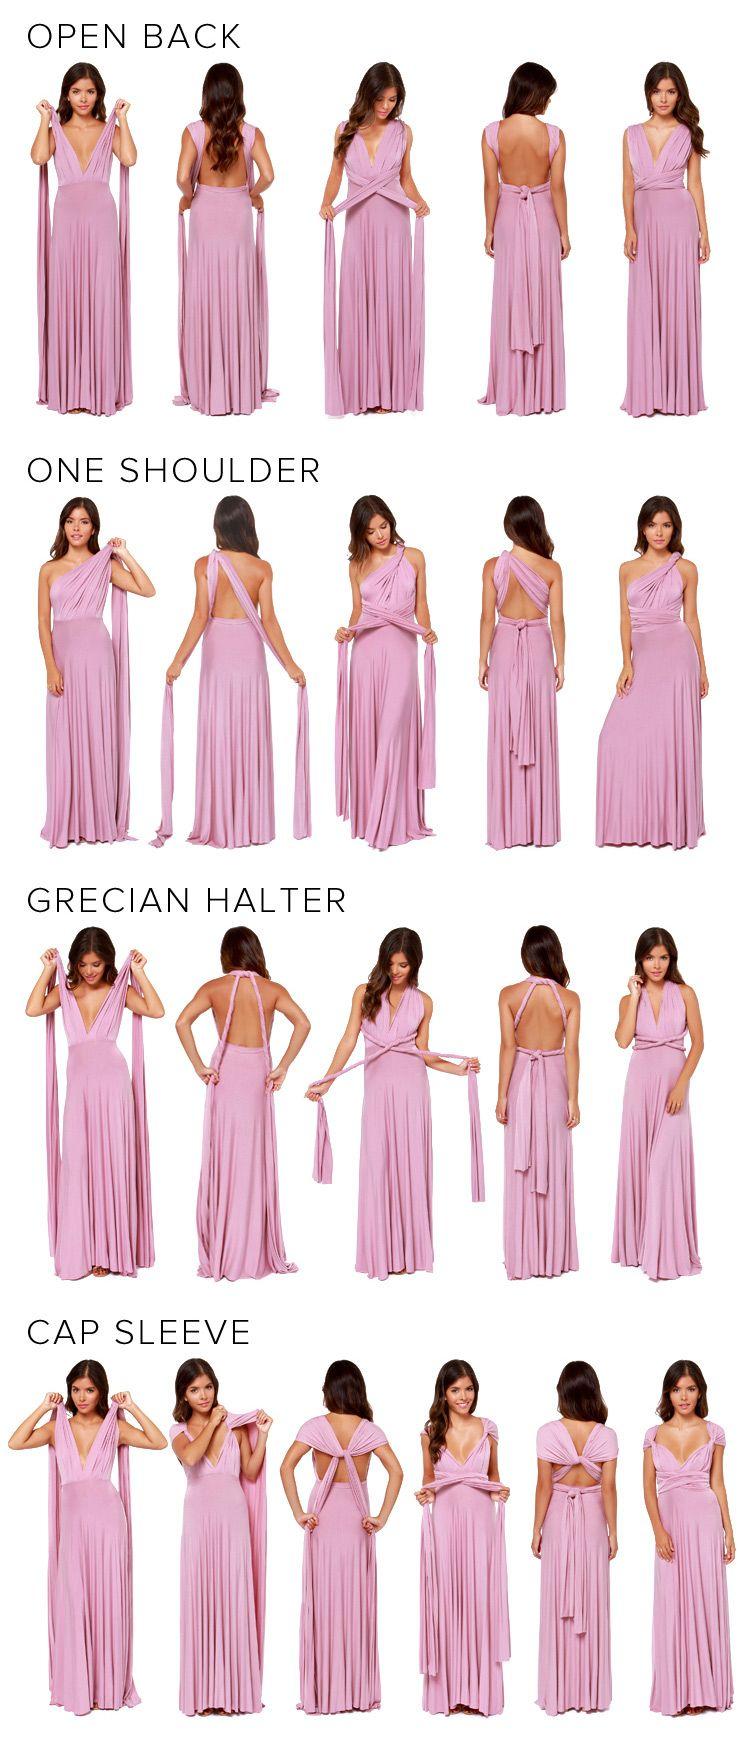 ... match your wedding ceremony style. Tricks of the Trade  Wrap Dress  Tutorial – Part II at LuLus.com! 6708904b10e3